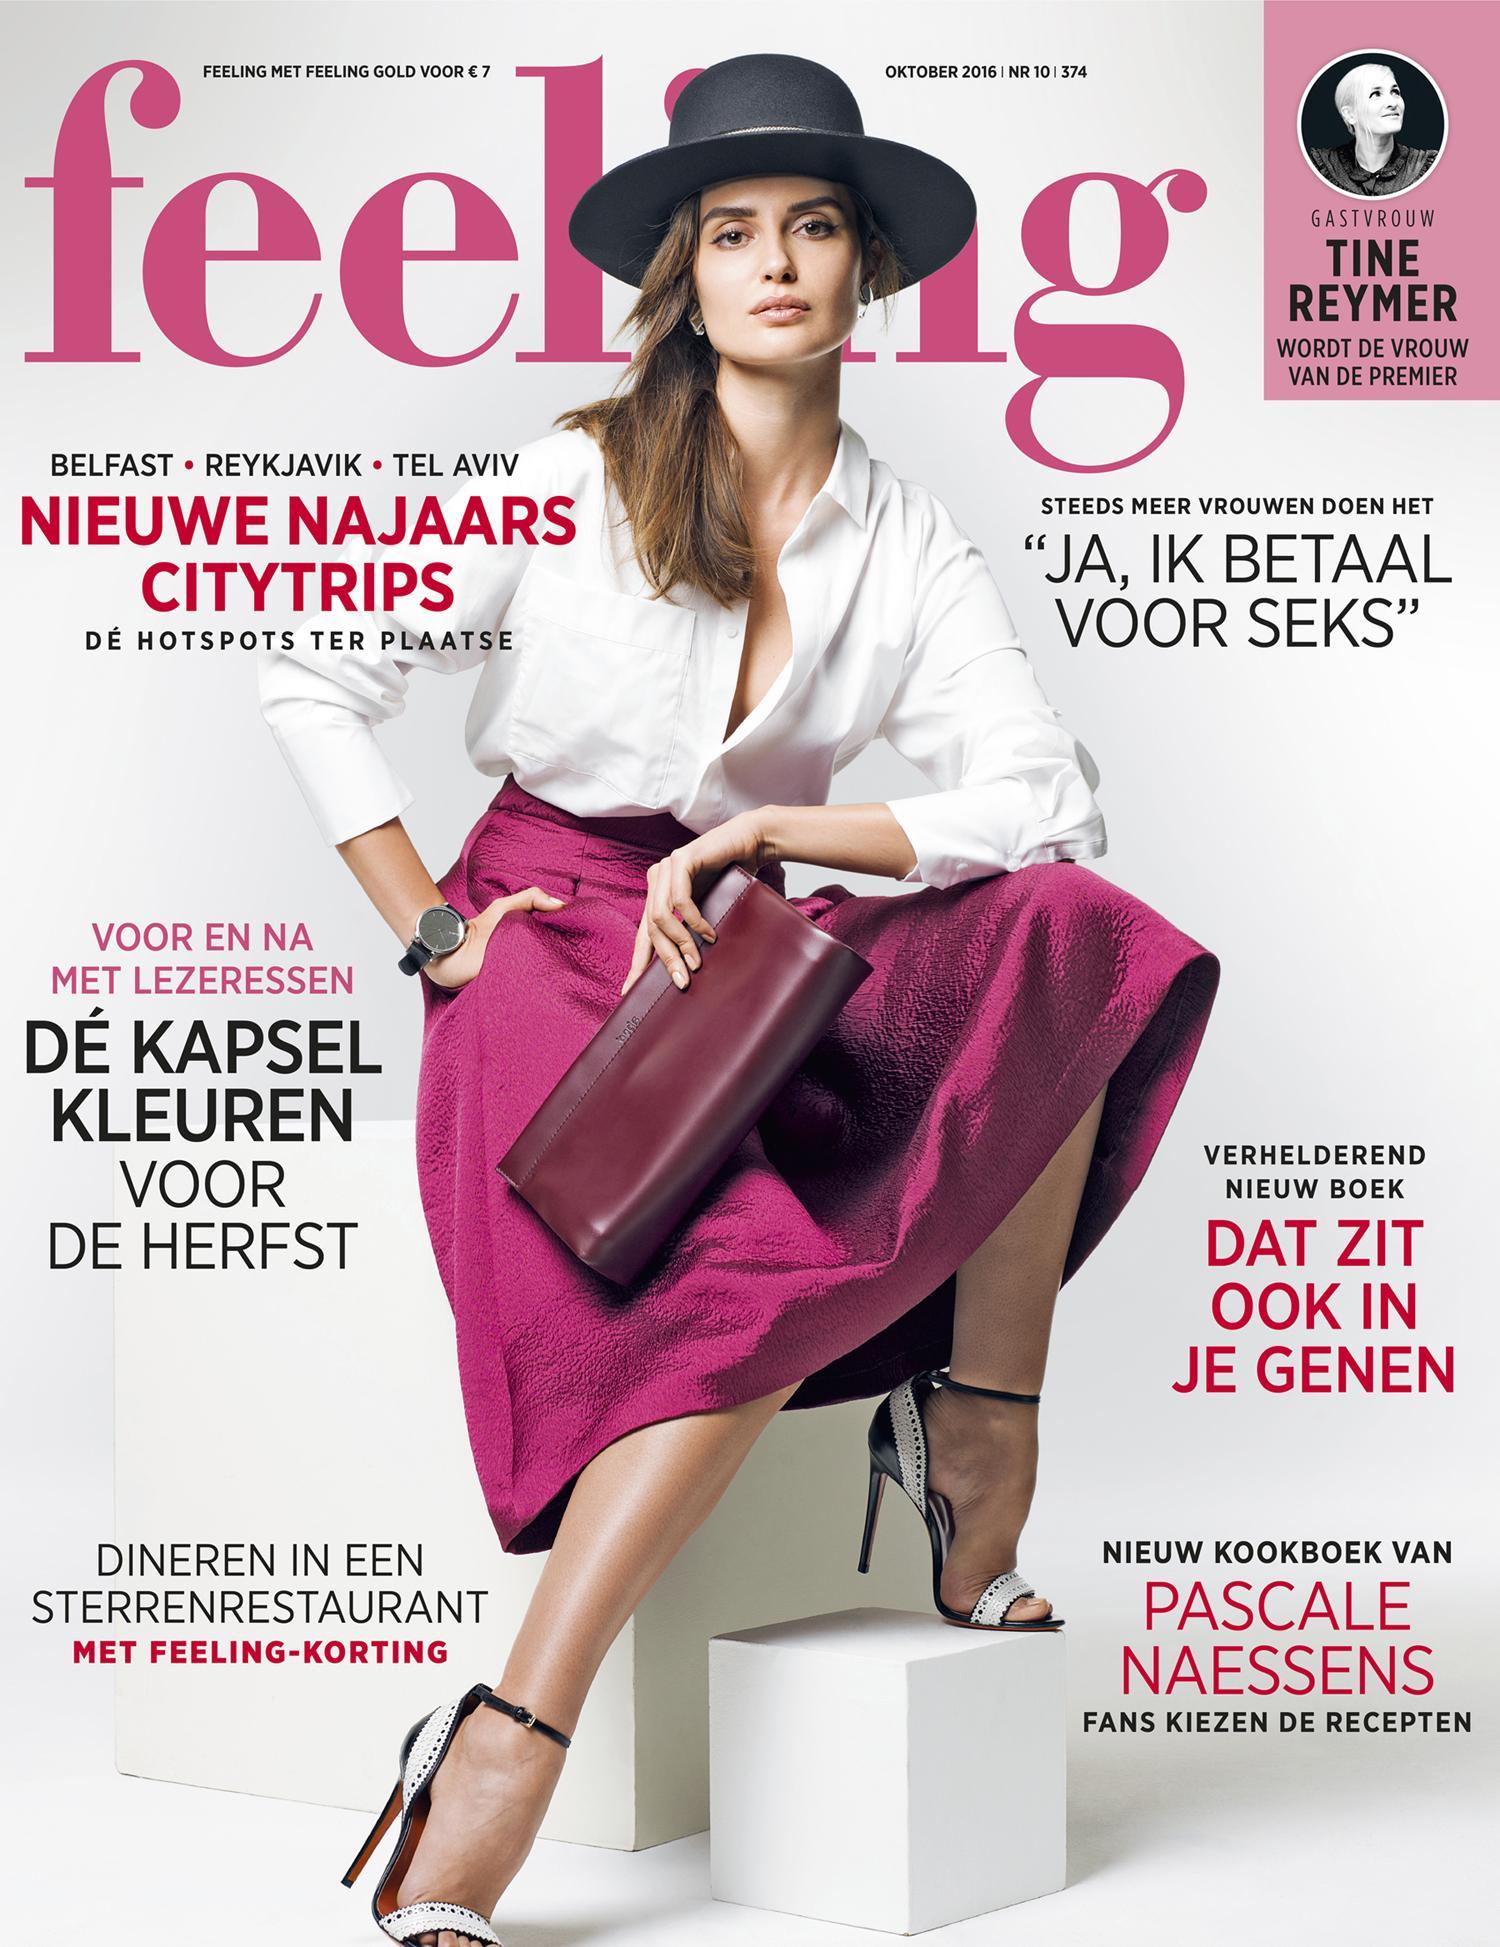 cover-oktober_edited-2